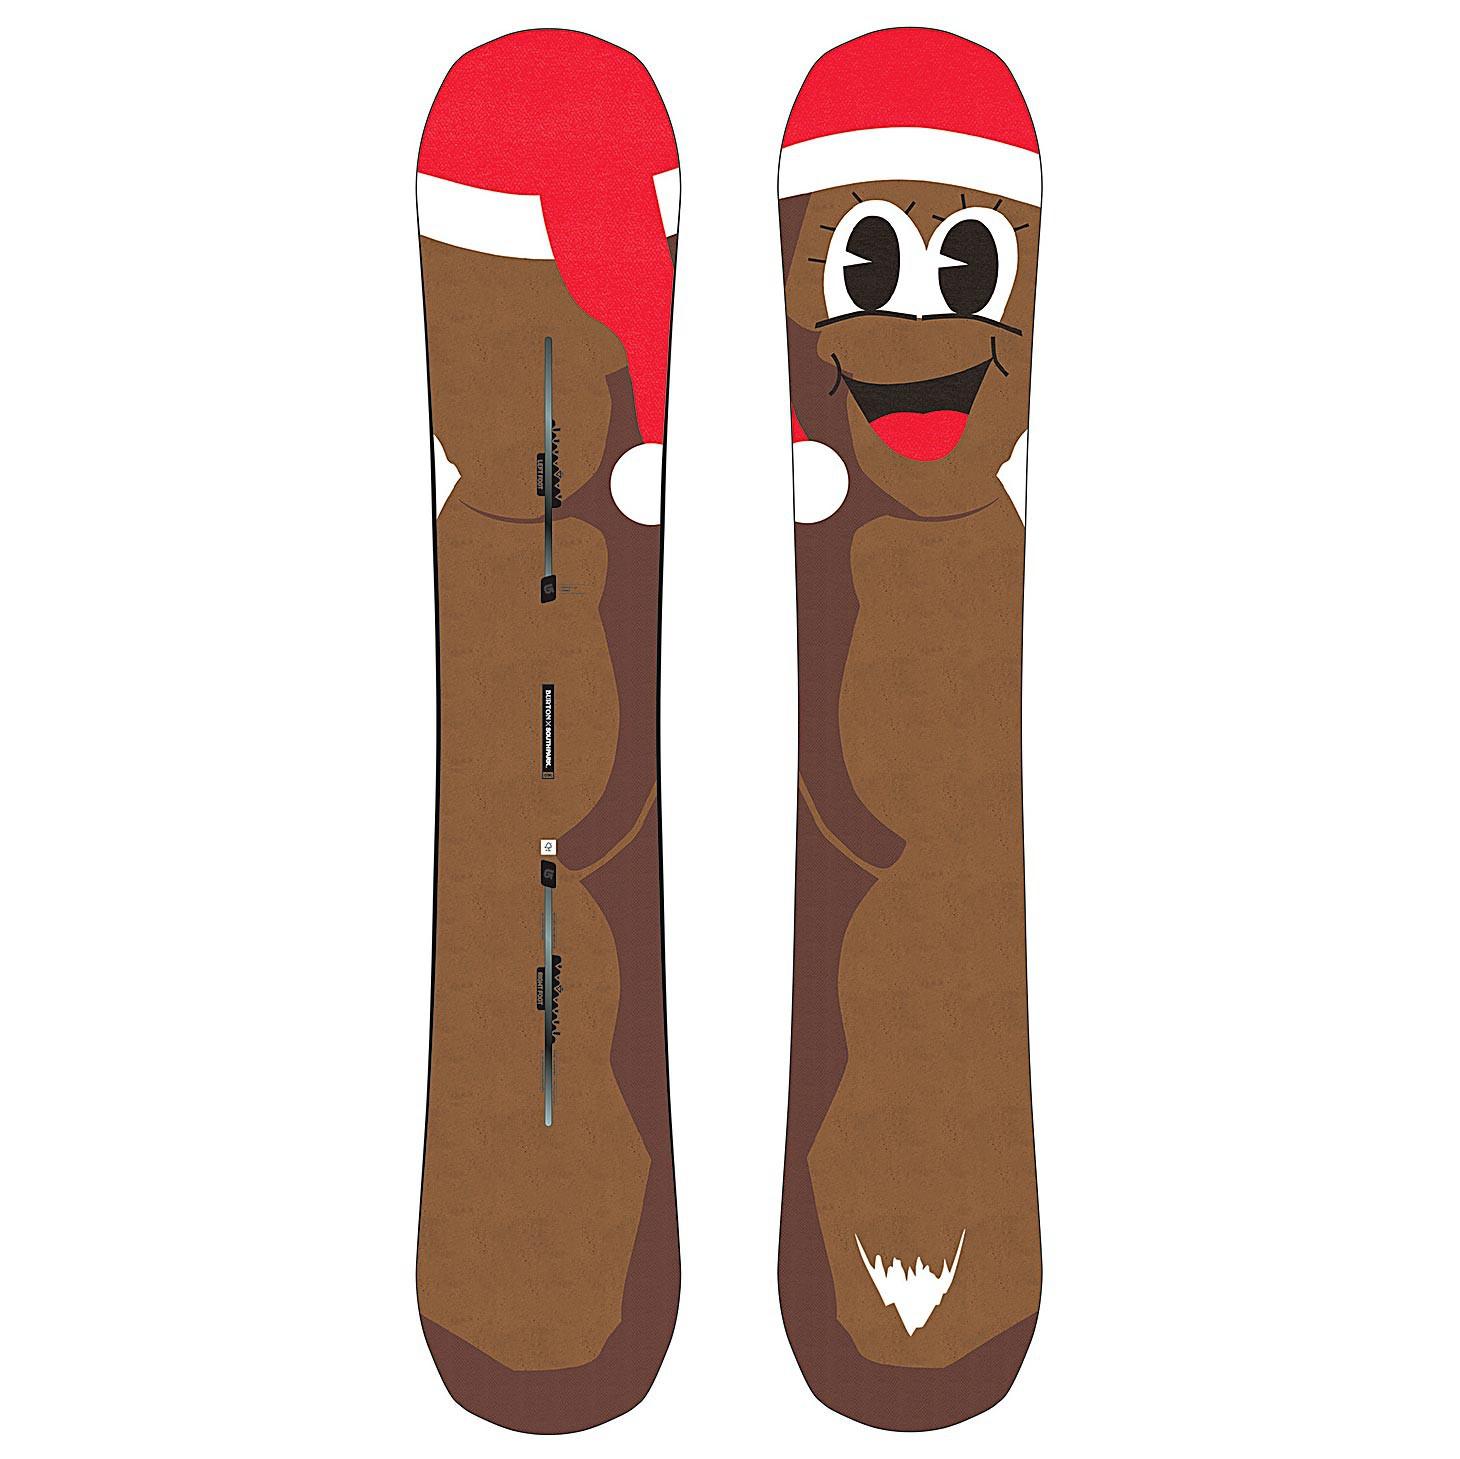 Snowboard Burton South Perkitect vel.160 16/17 + doručení do 24 hodin